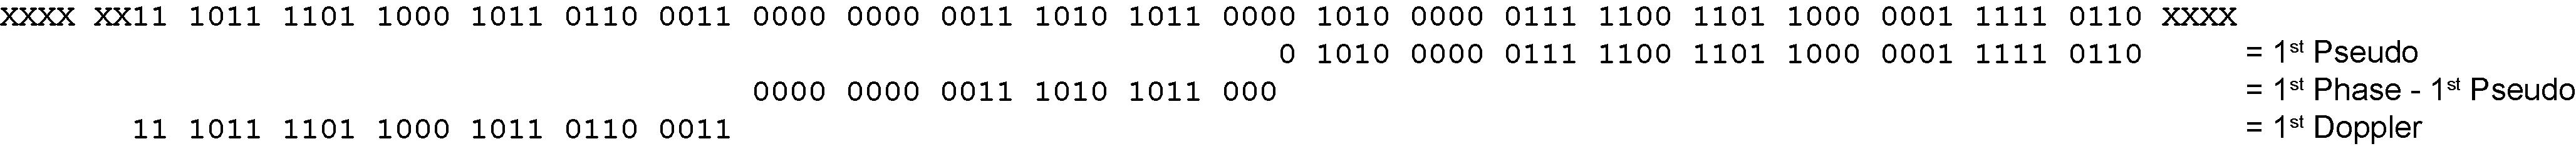 Example of Bit Parsing a RANGECMP4 Log